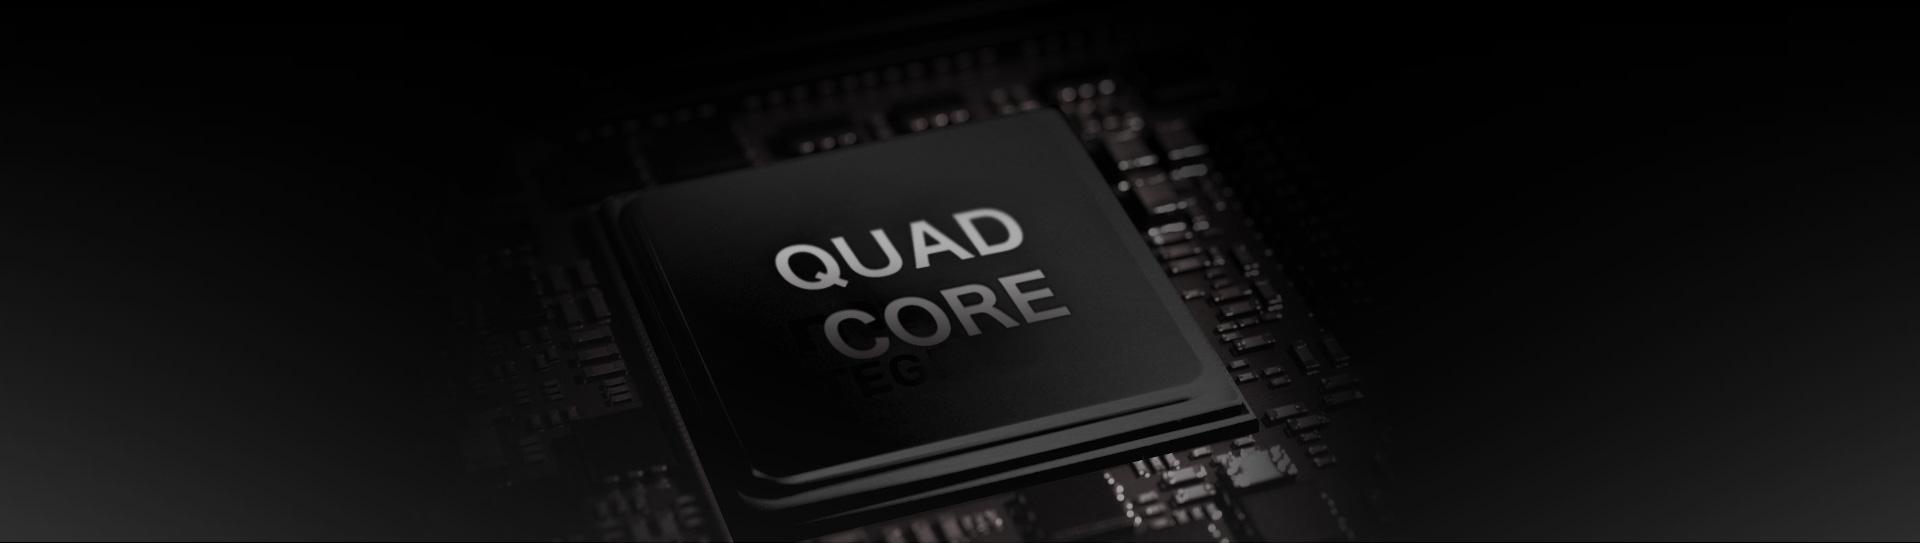 Huawei_Y5_quad-core_cpu